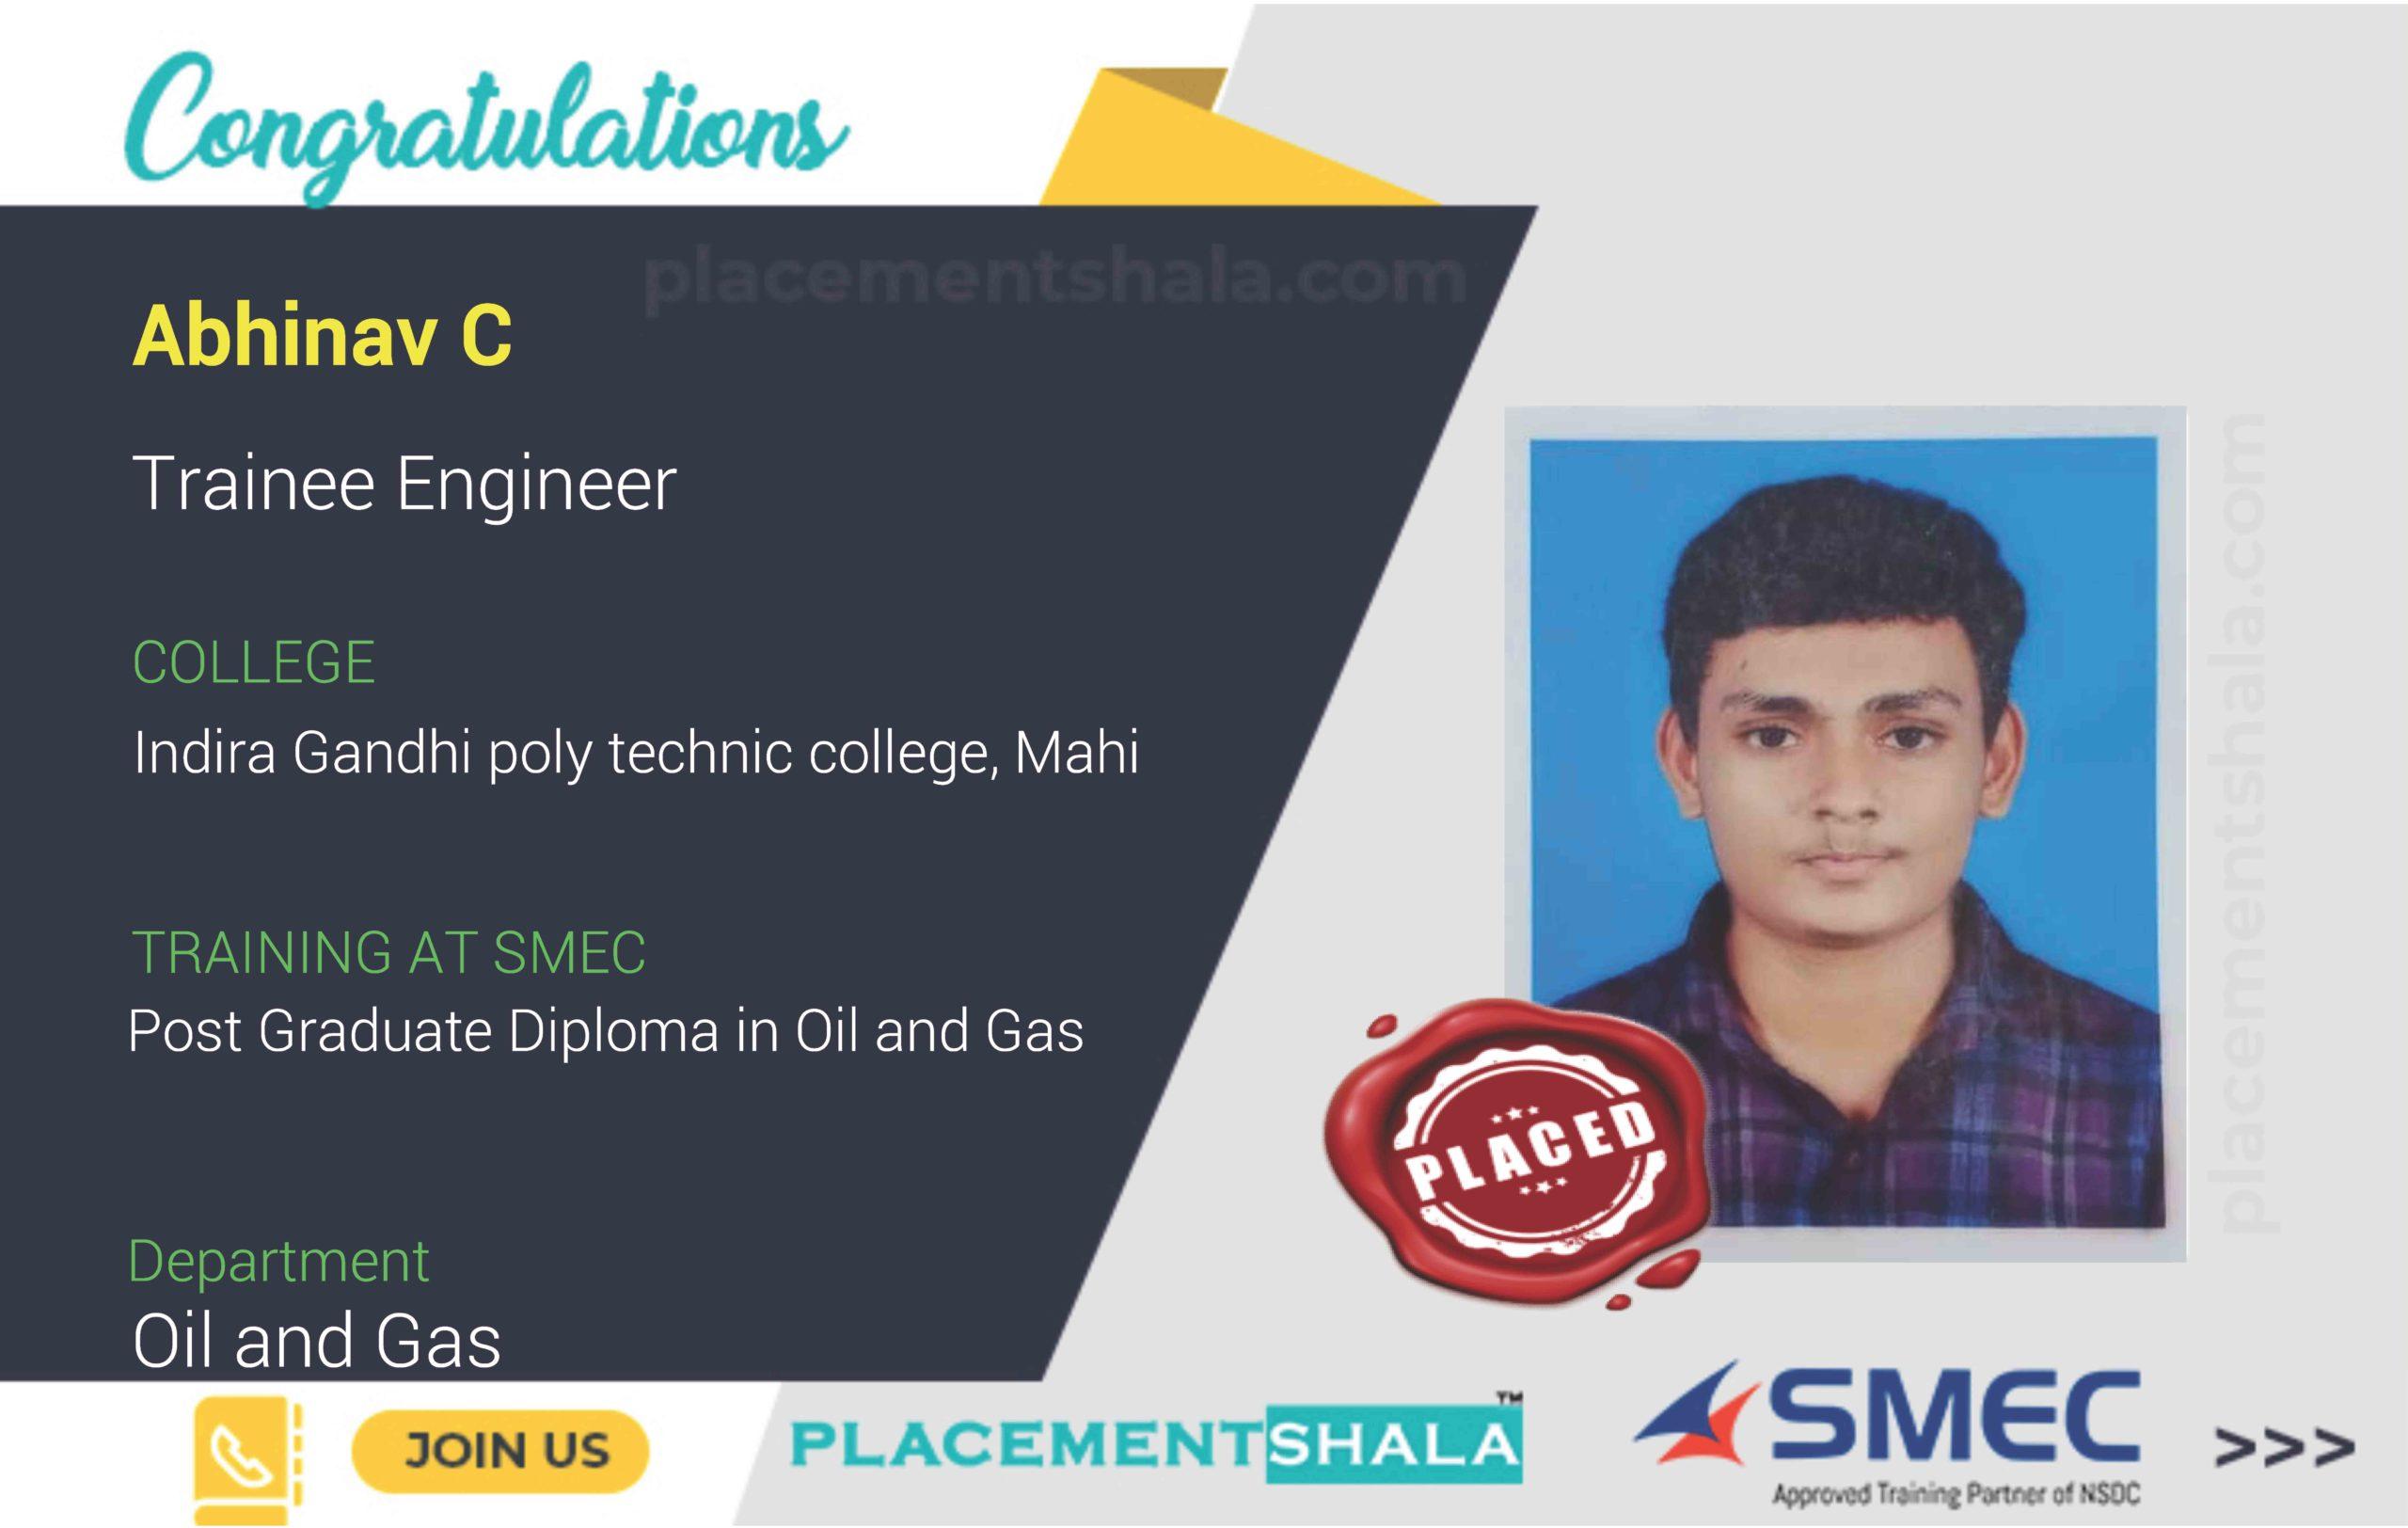 Abhinav C is placed as Trainee Engineer